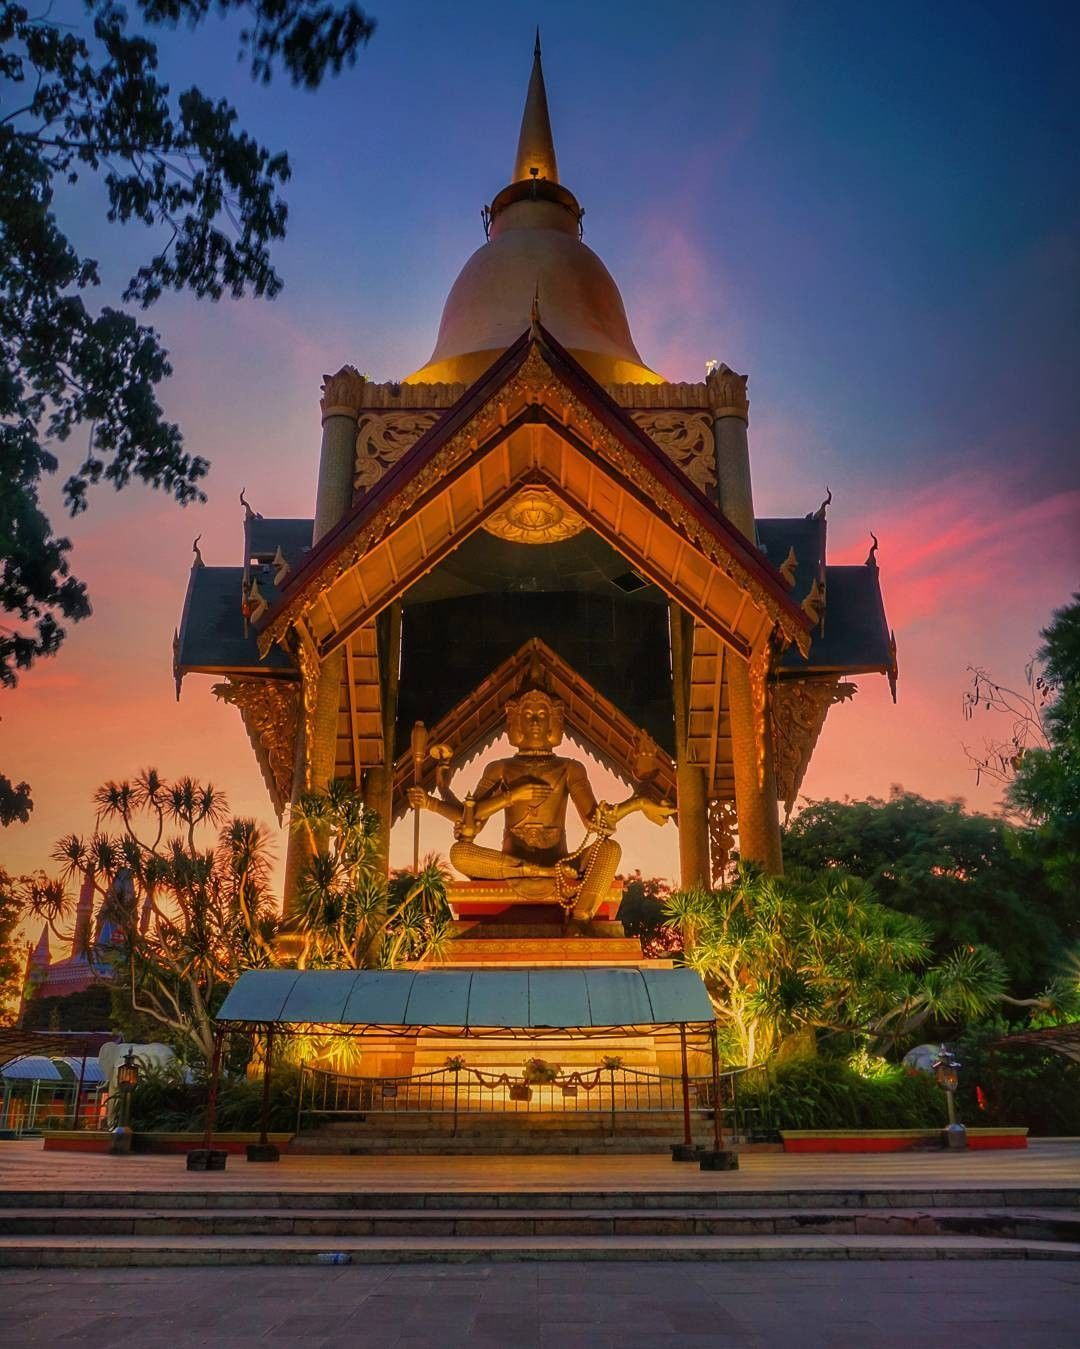 7 Tempat Wisata Religi Surabaya Kota Multietnis Mengagumkan Patung Budha